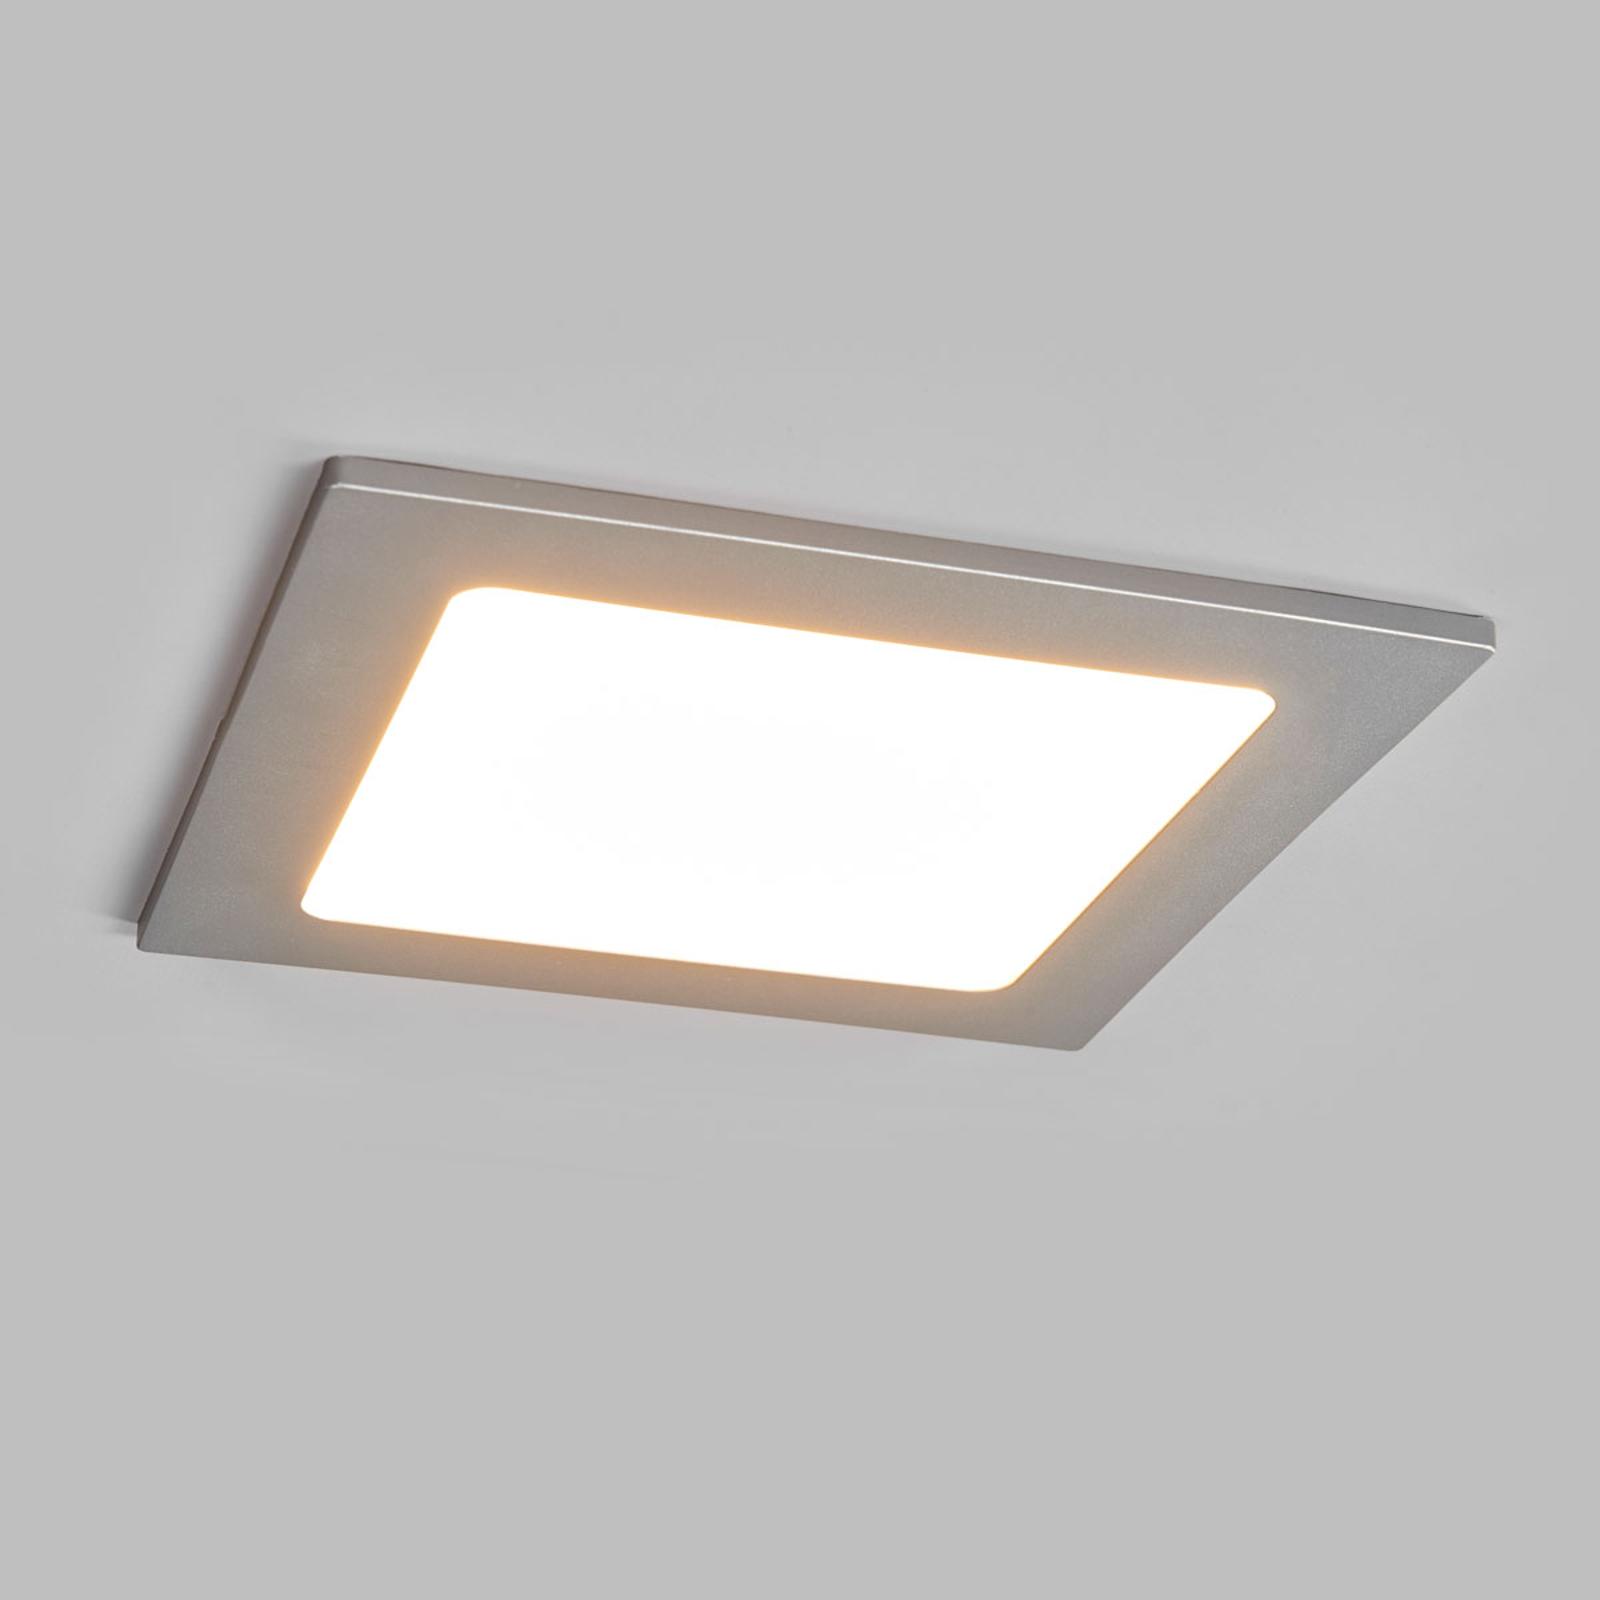 Foco empotrado LED Joki plata 3000K angular 16,5cm